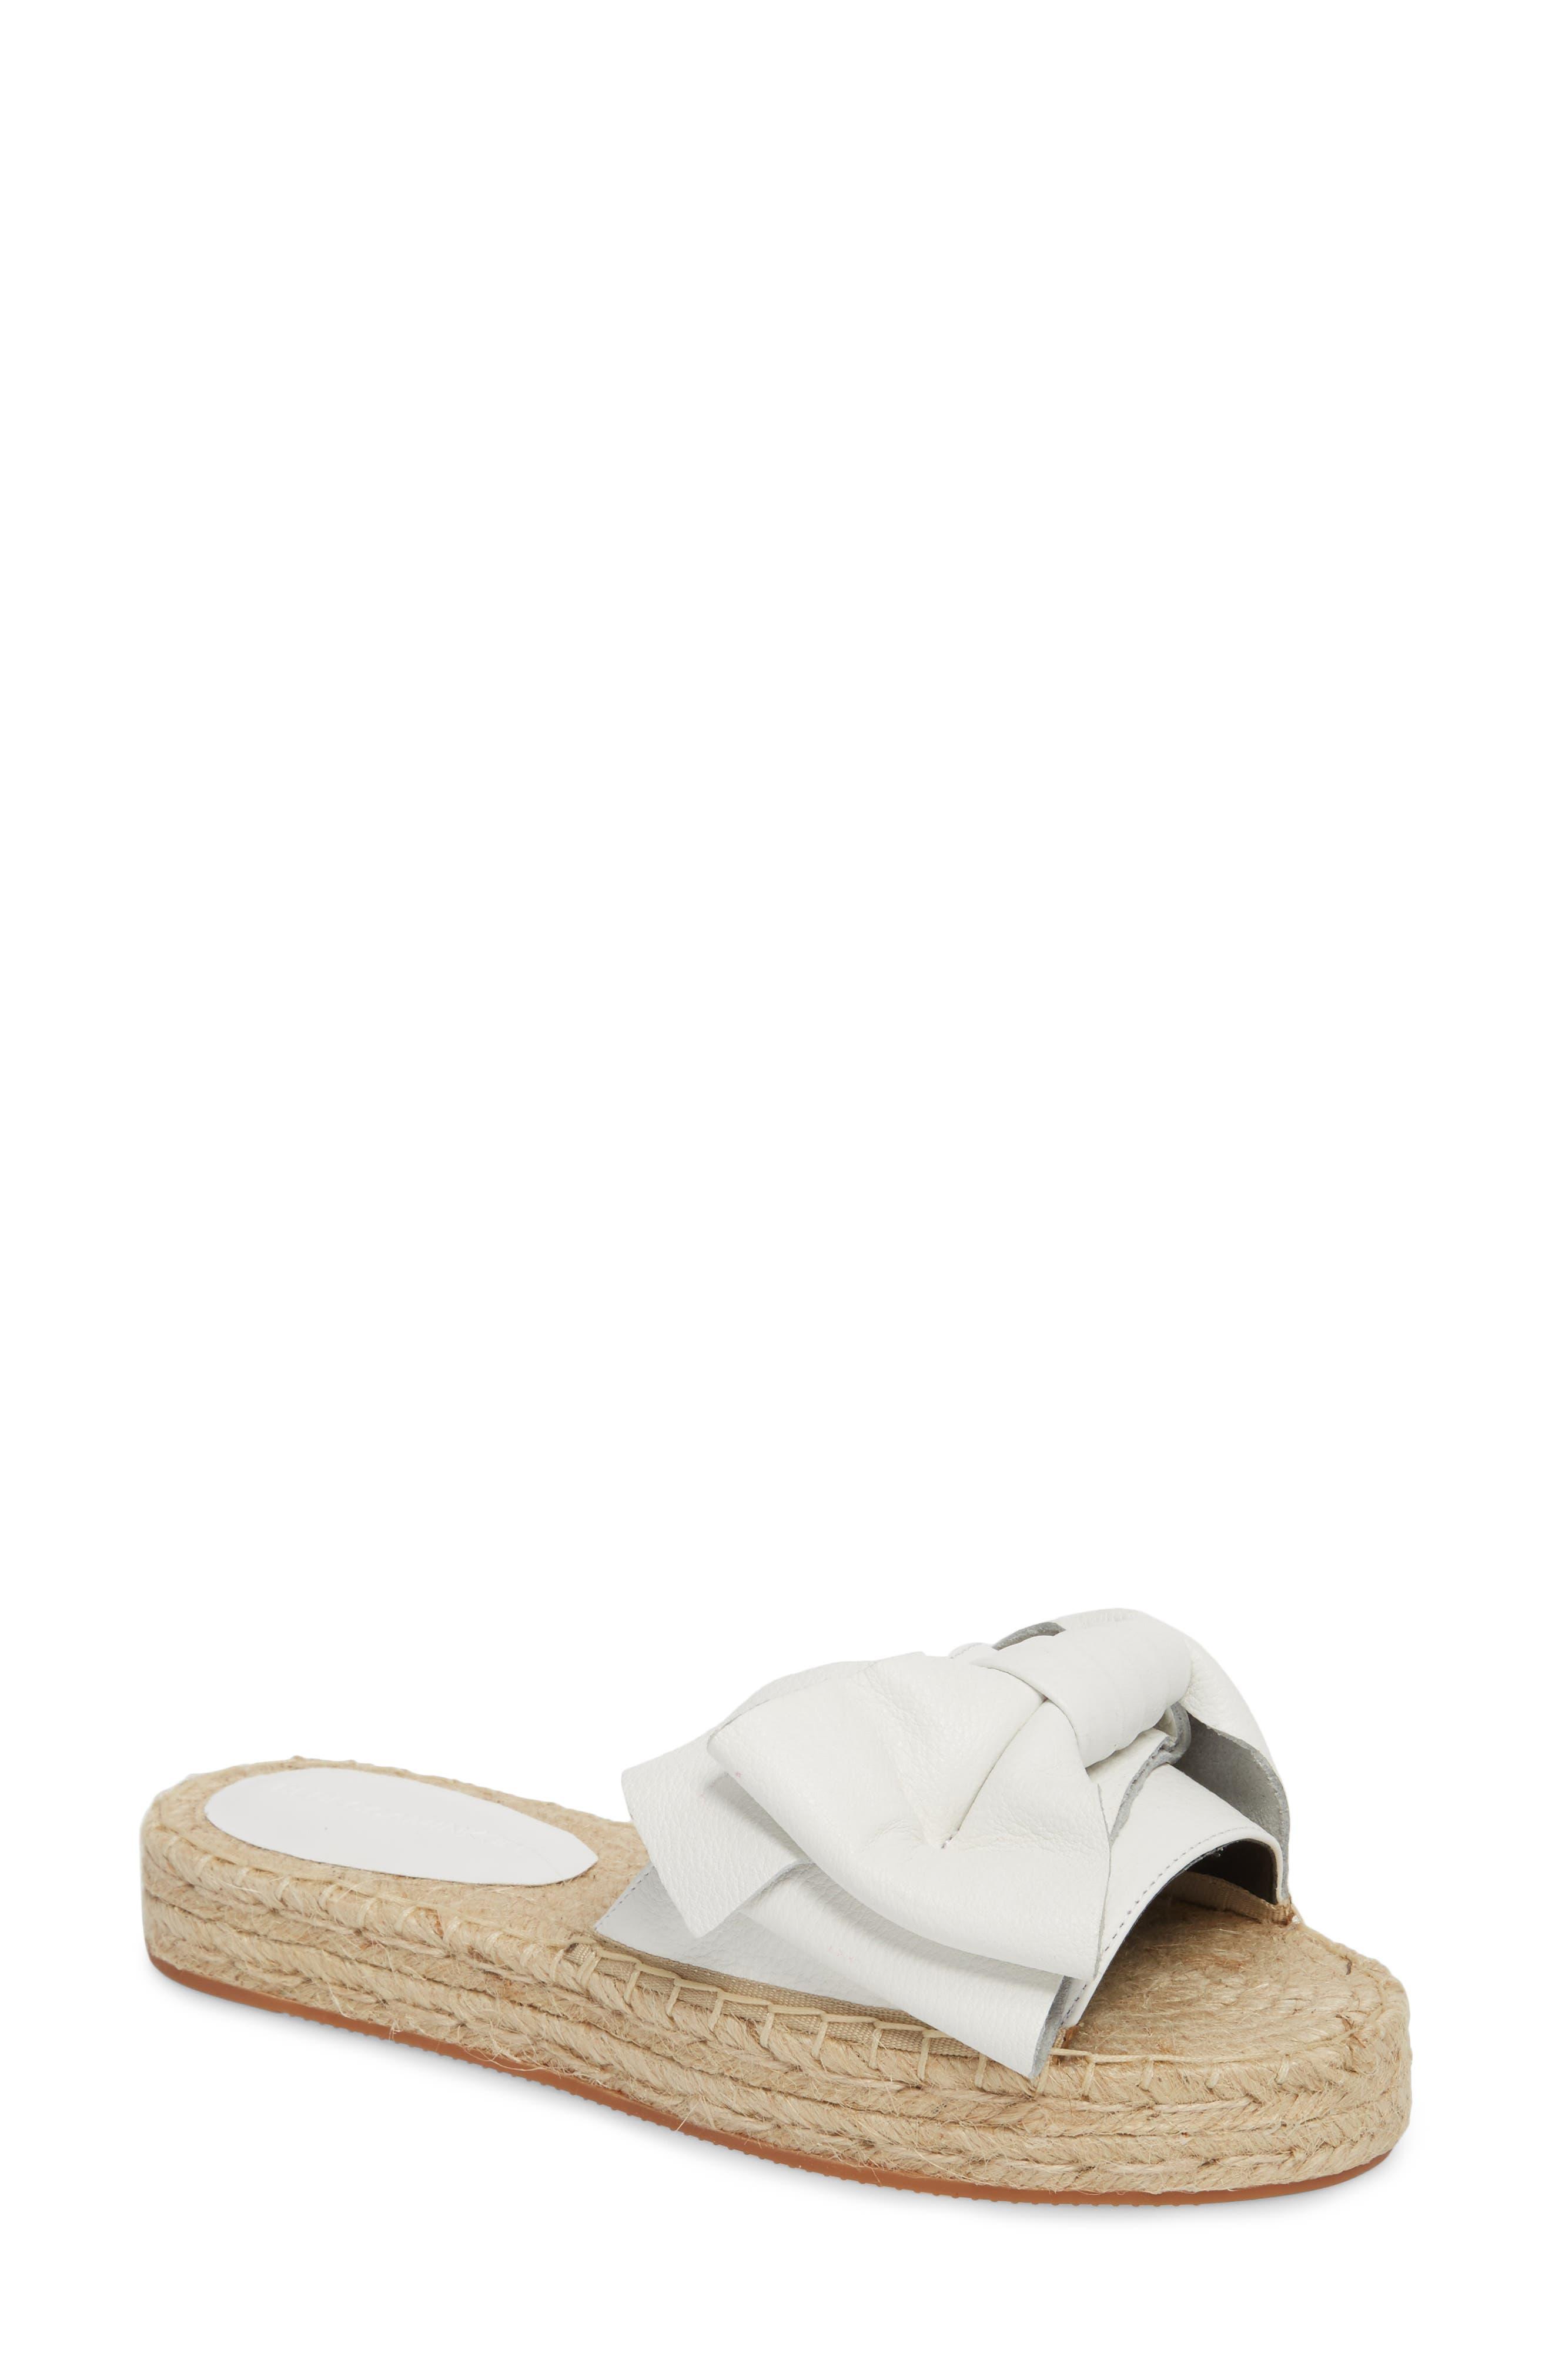 Giana Bow Slide Sandal,                             Main thumbnail 1, color,                             Optic White Leather